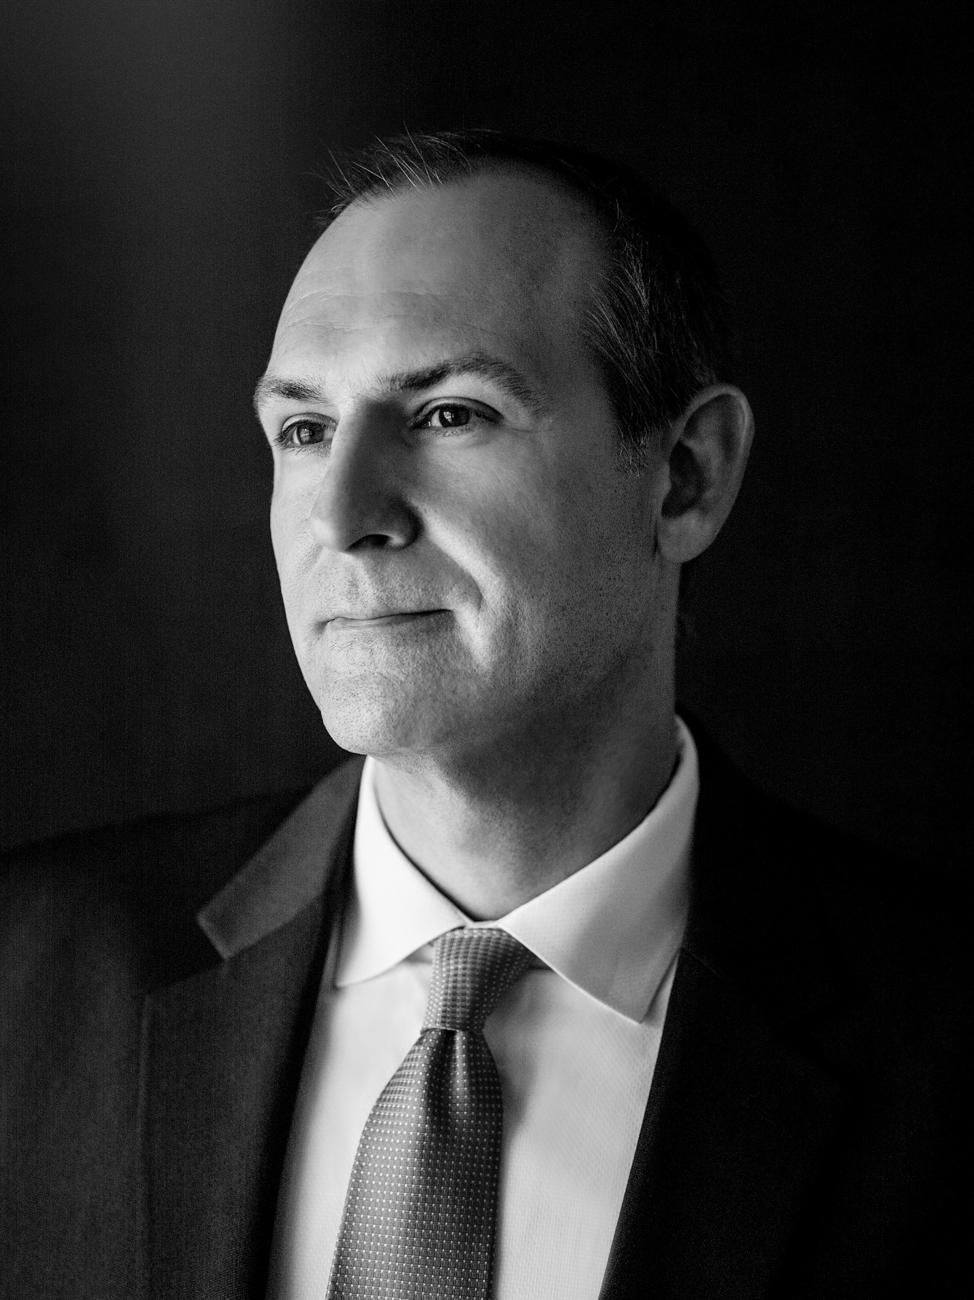 Erik Heuser